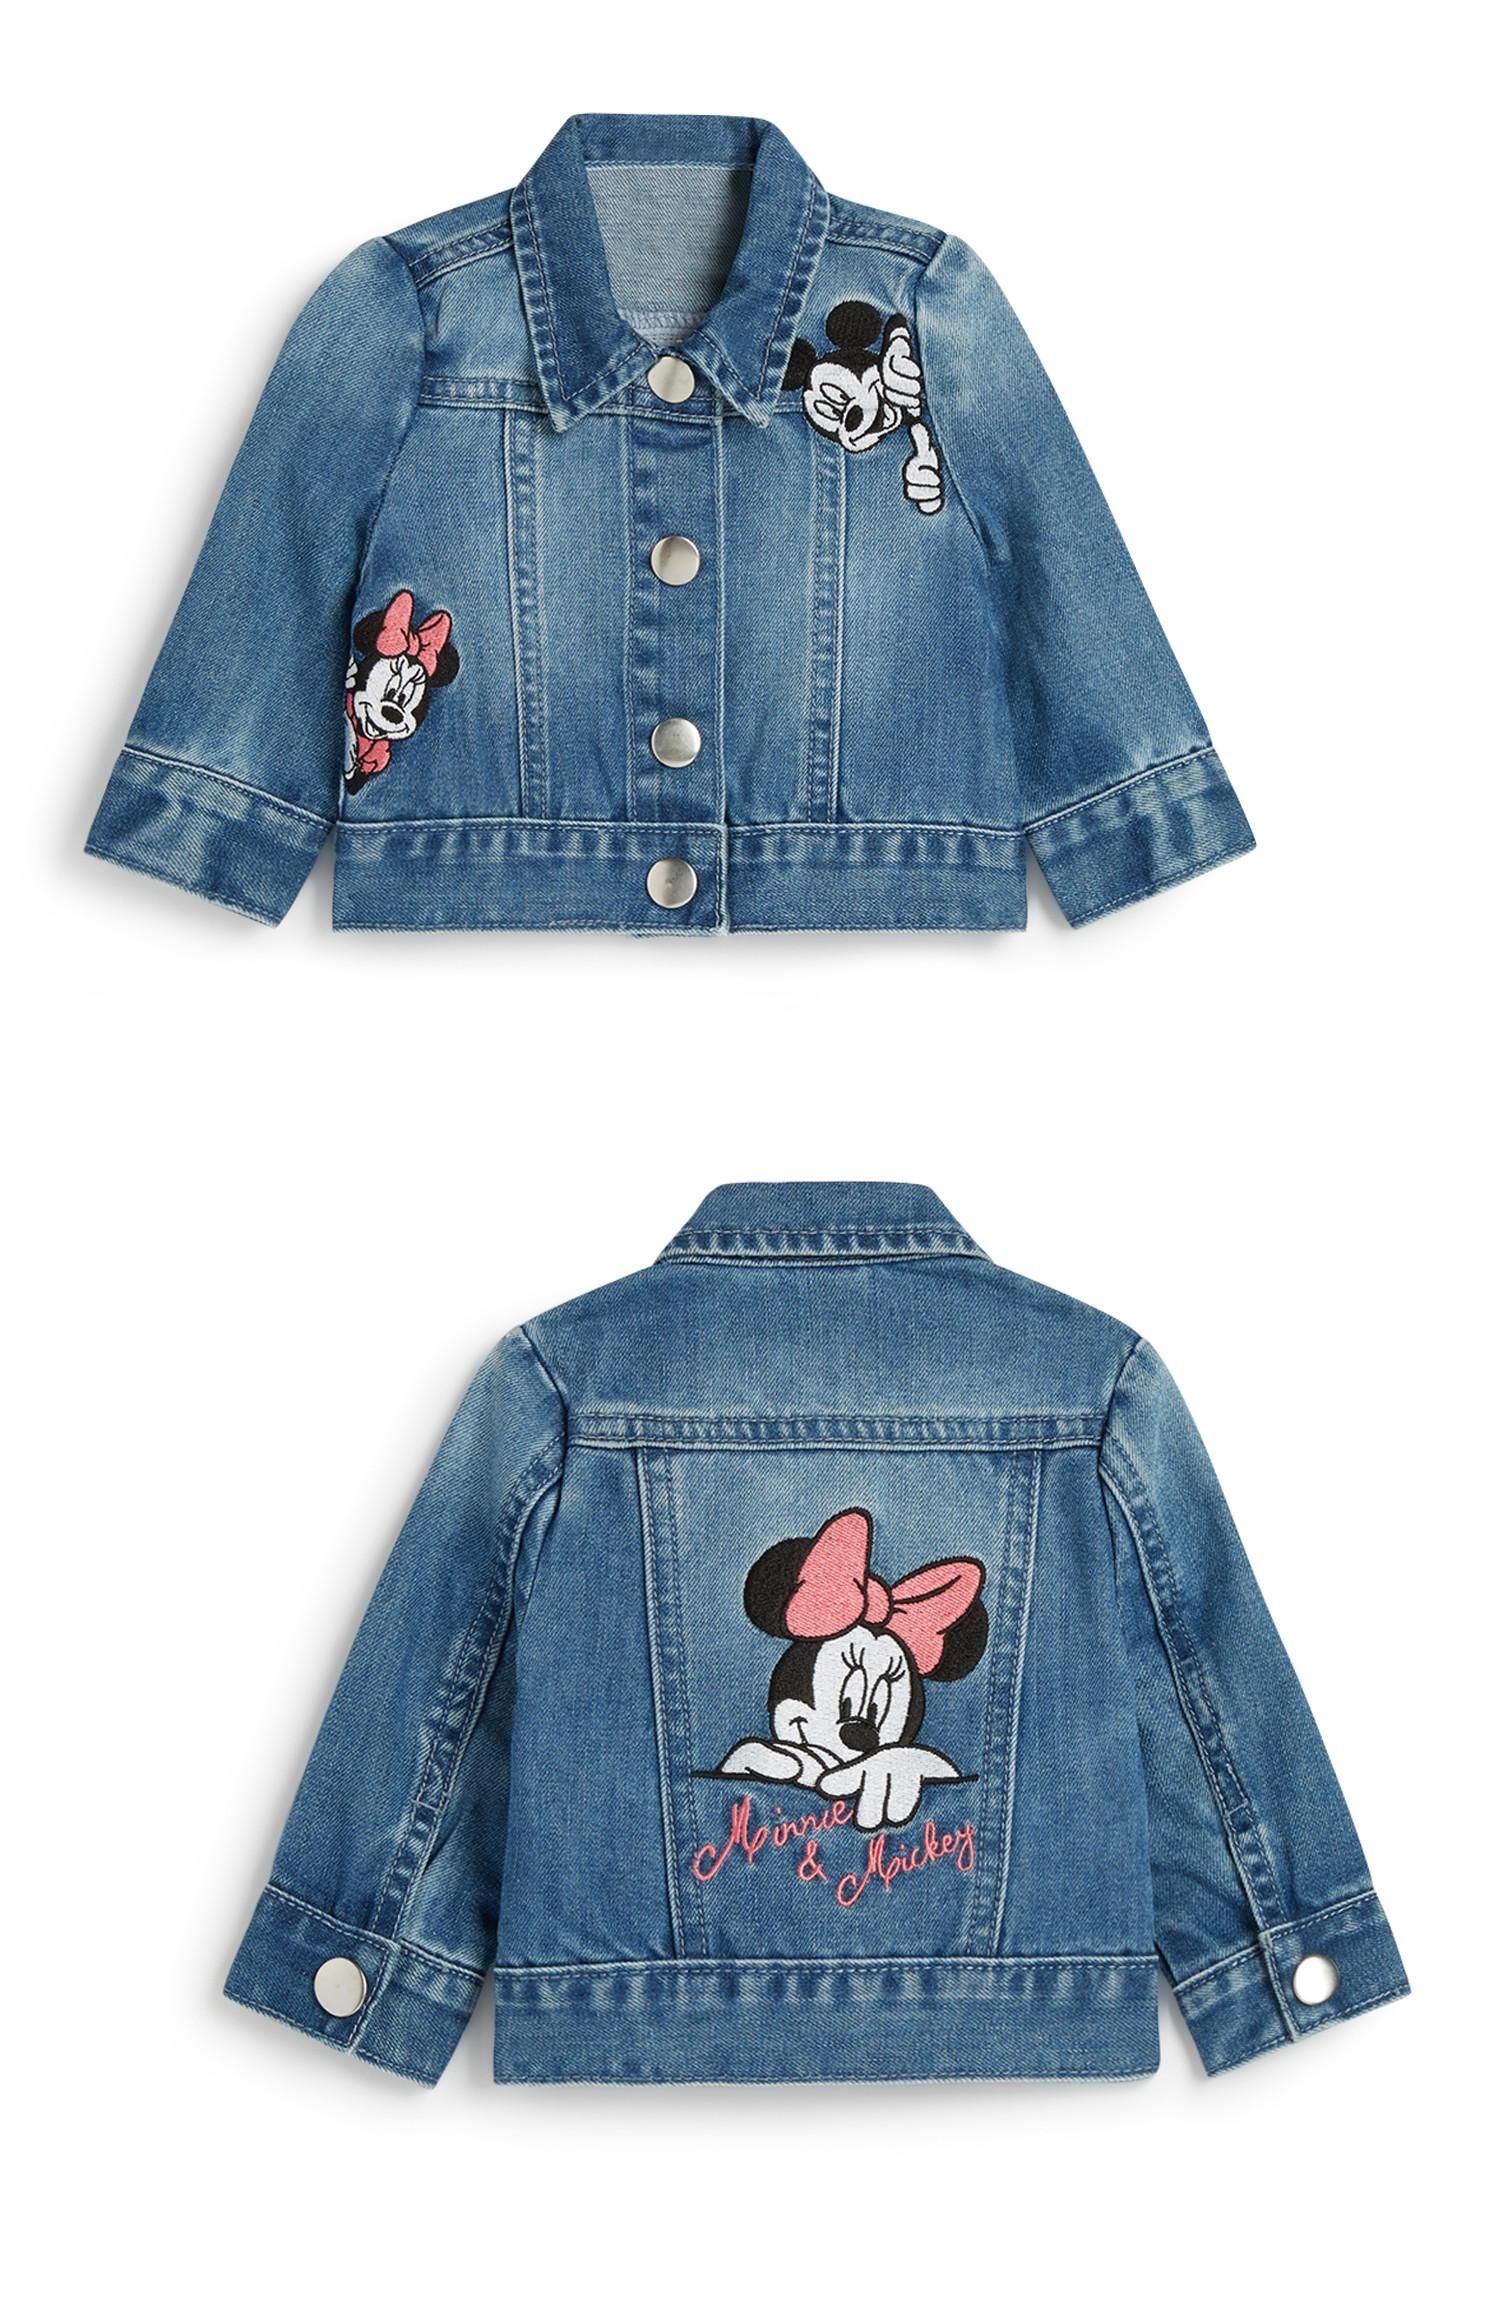 Primark Baby Girl Minnie Mouse Denim Jacket Baby Denim Jacket Jean Jacket For Girls Girls Denim Jacket [ 2324 x 1500 Pixel ]